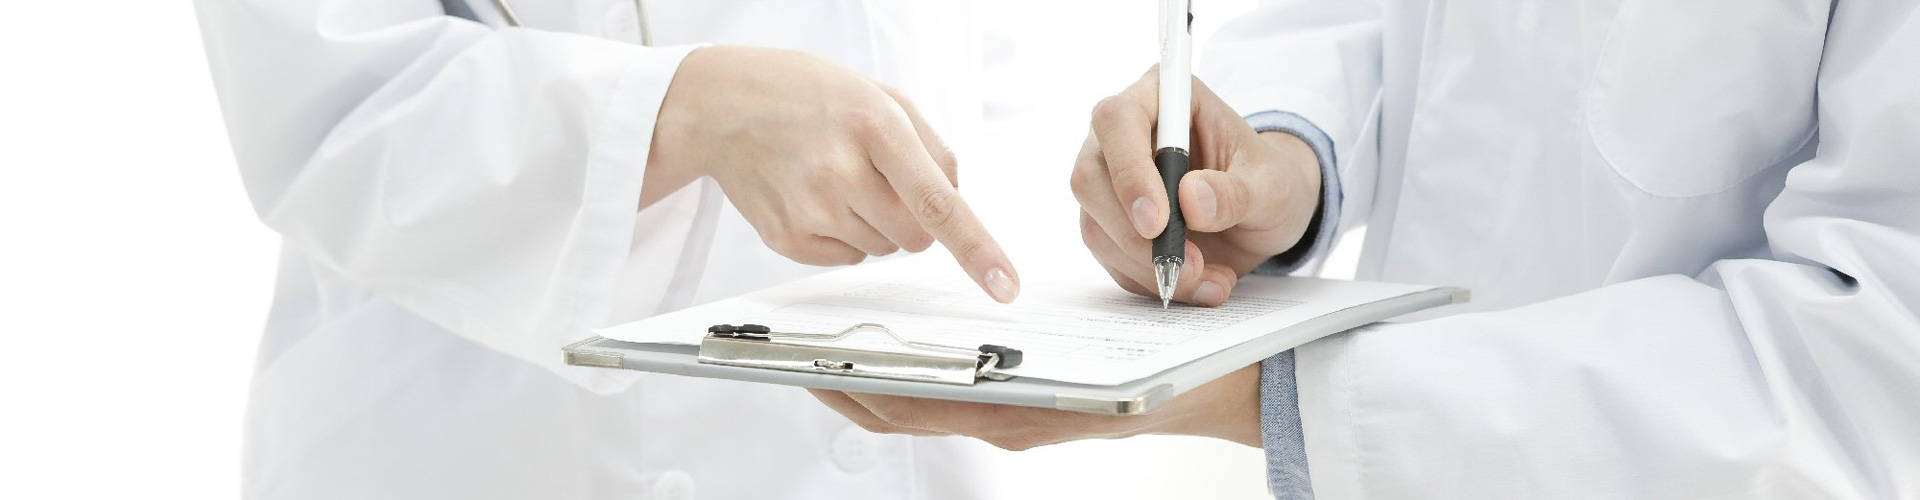 Medicina a Misura D'Uomo Pisa